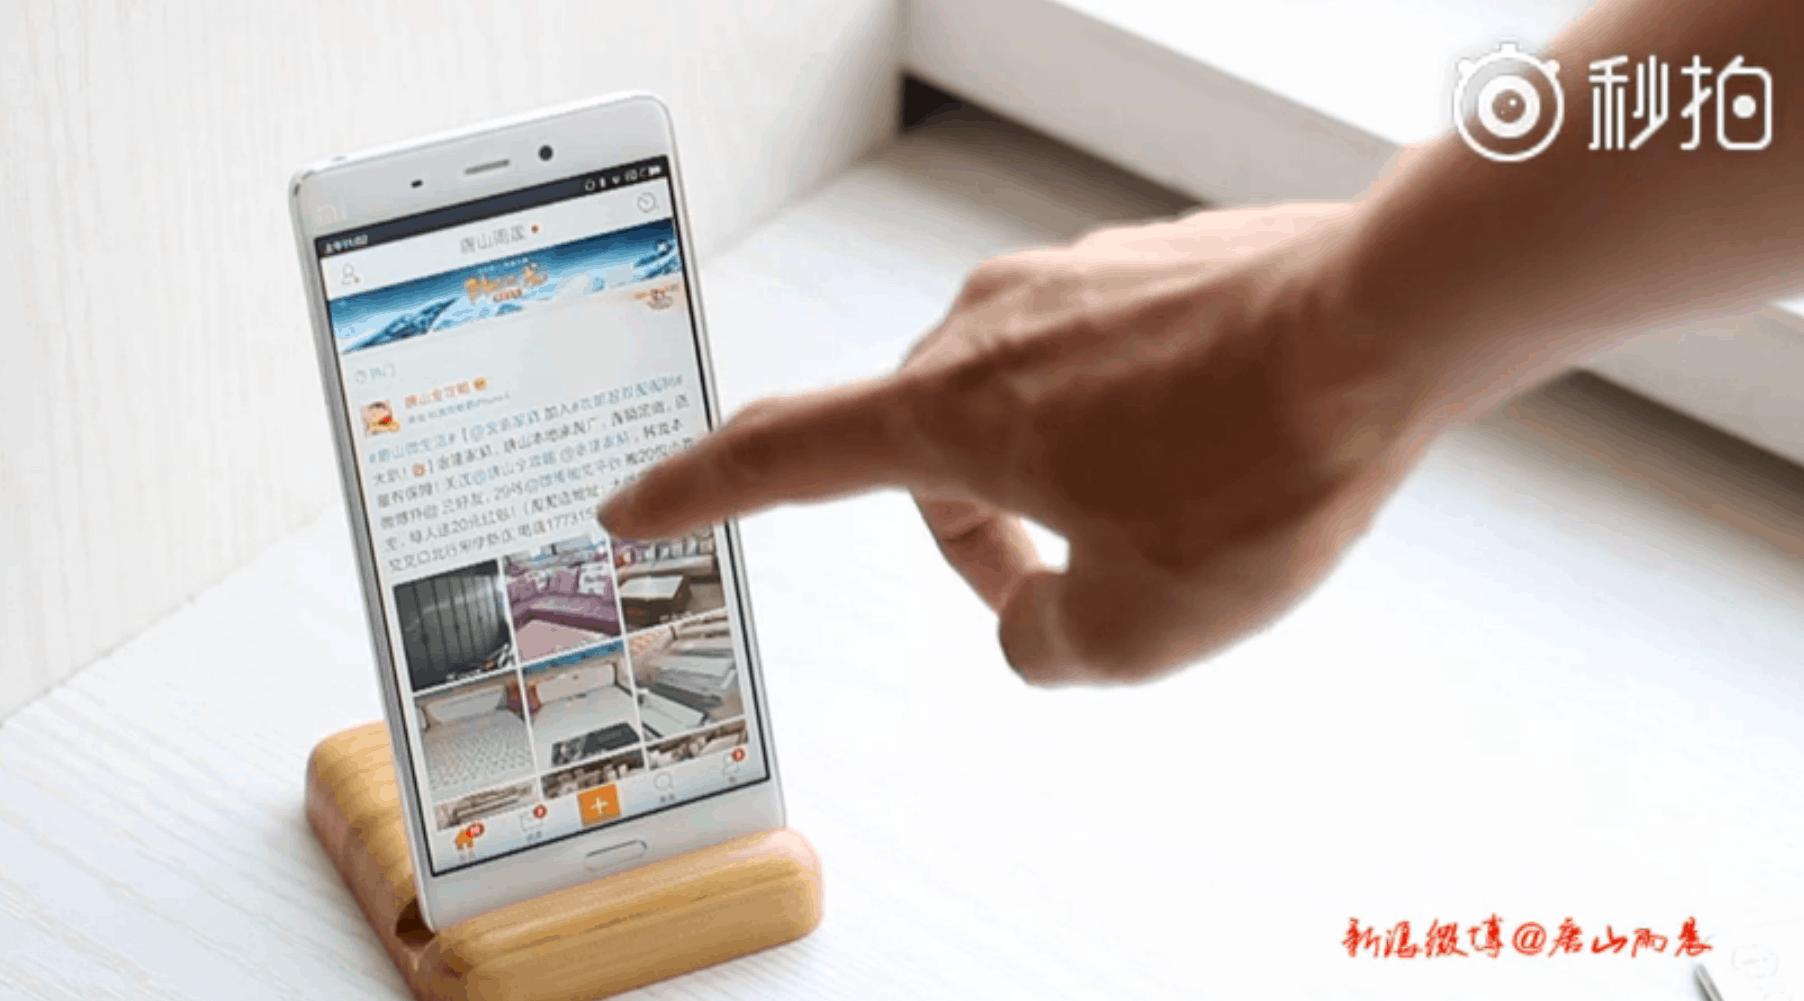 Xiaomi Mi 5 video leak_1